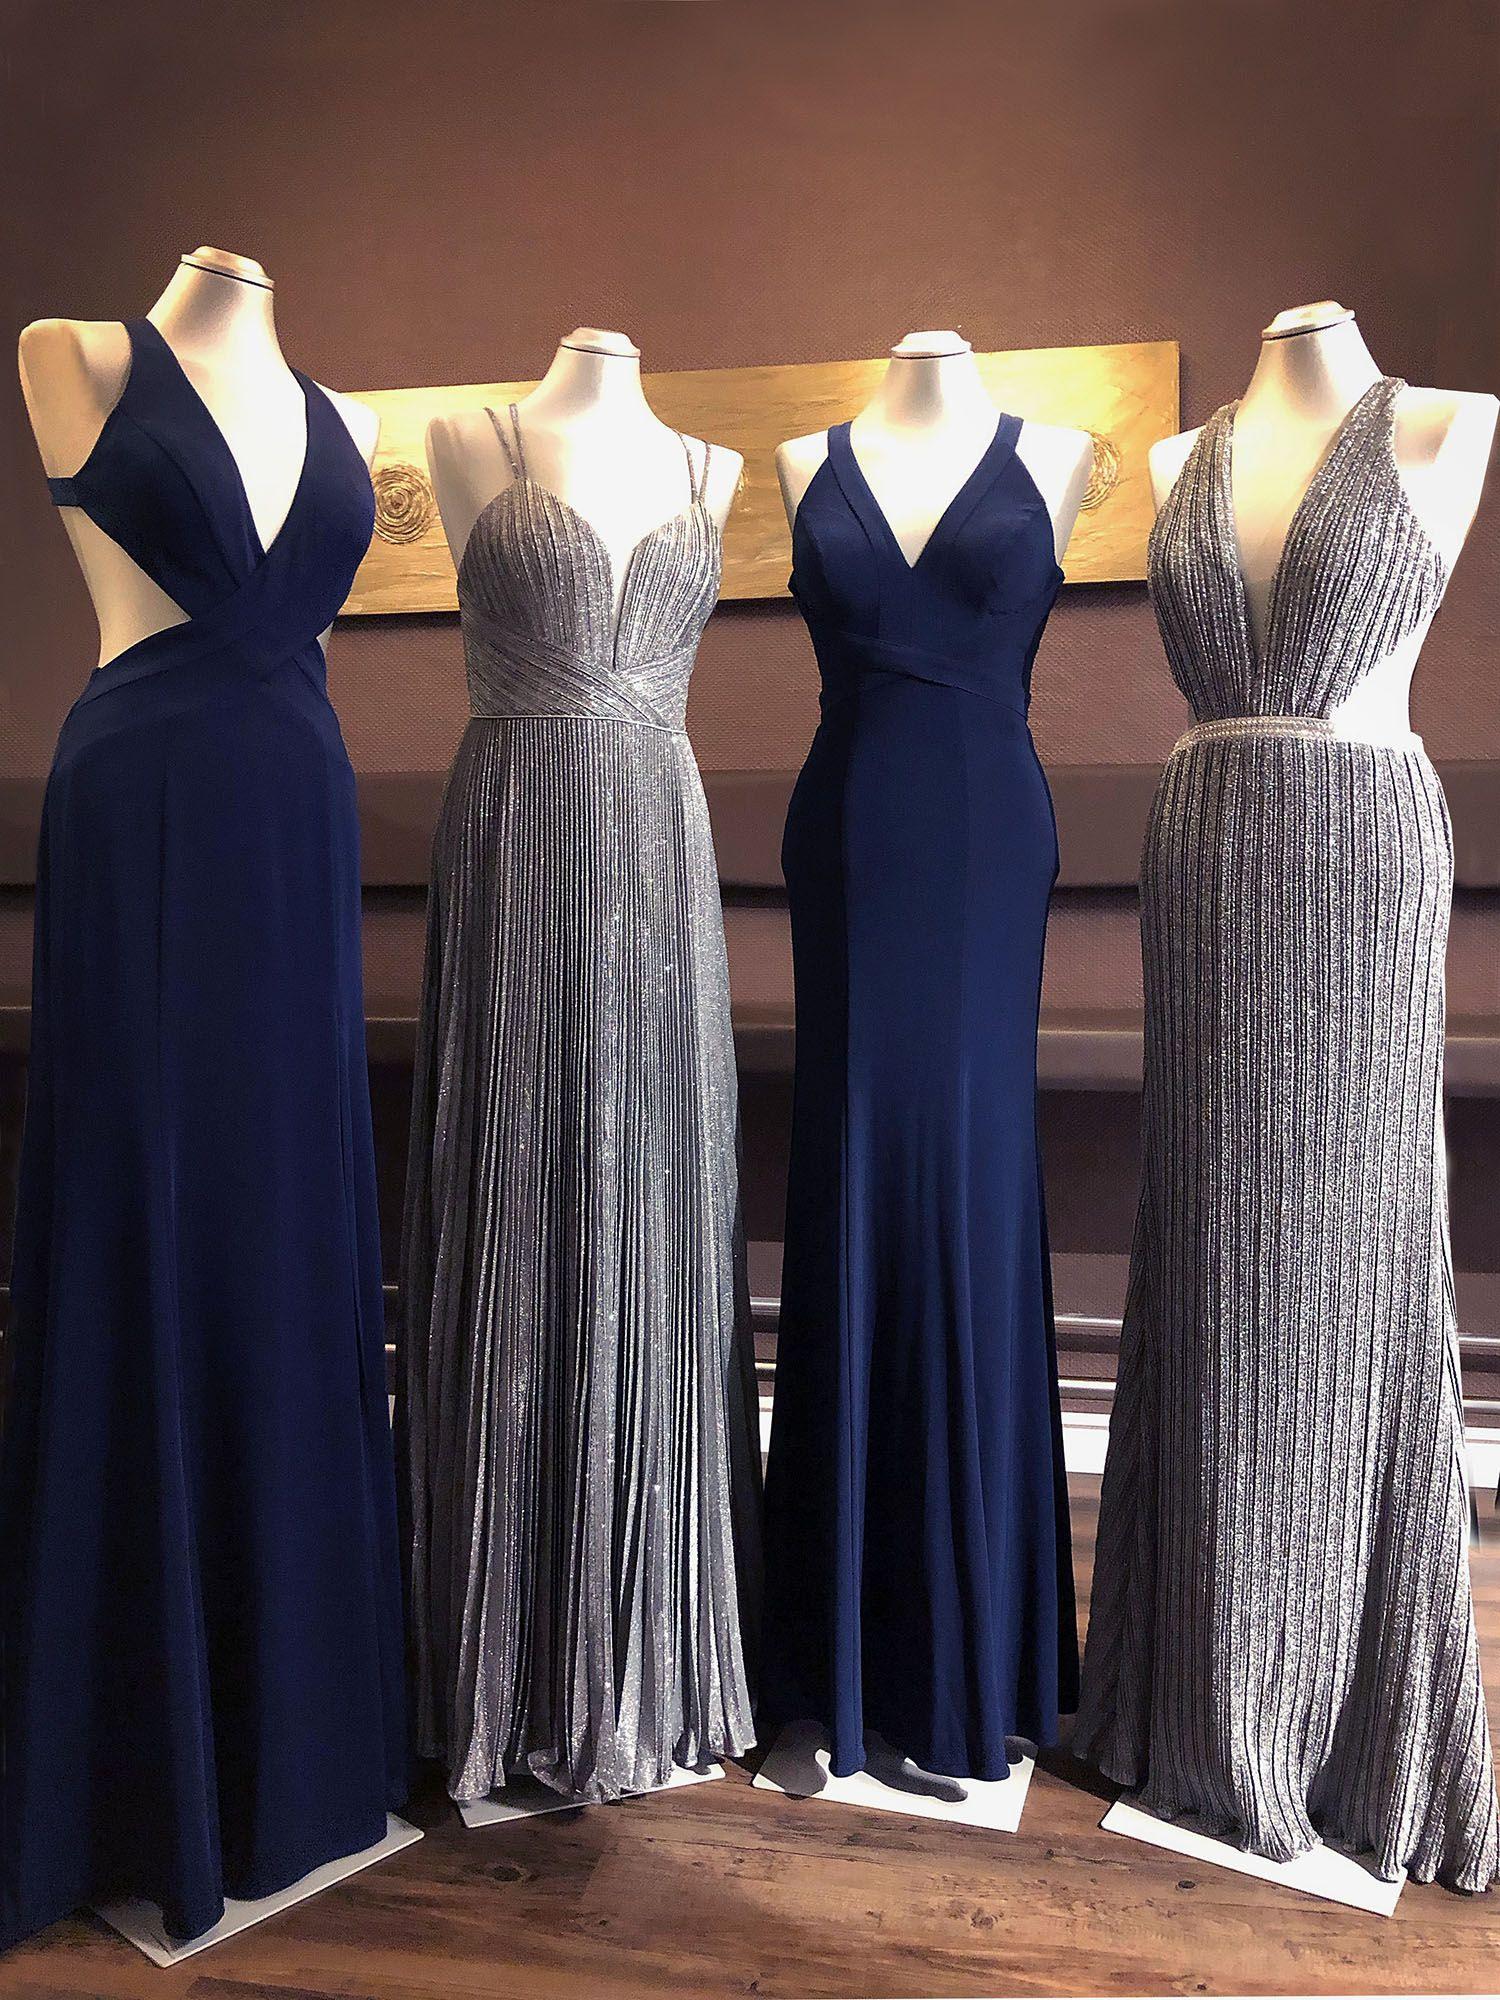 10 Luxurius Abendkleid Junge Mode Boutique15 Erstaunlich Abendkleid Junge Mode Bester Preis